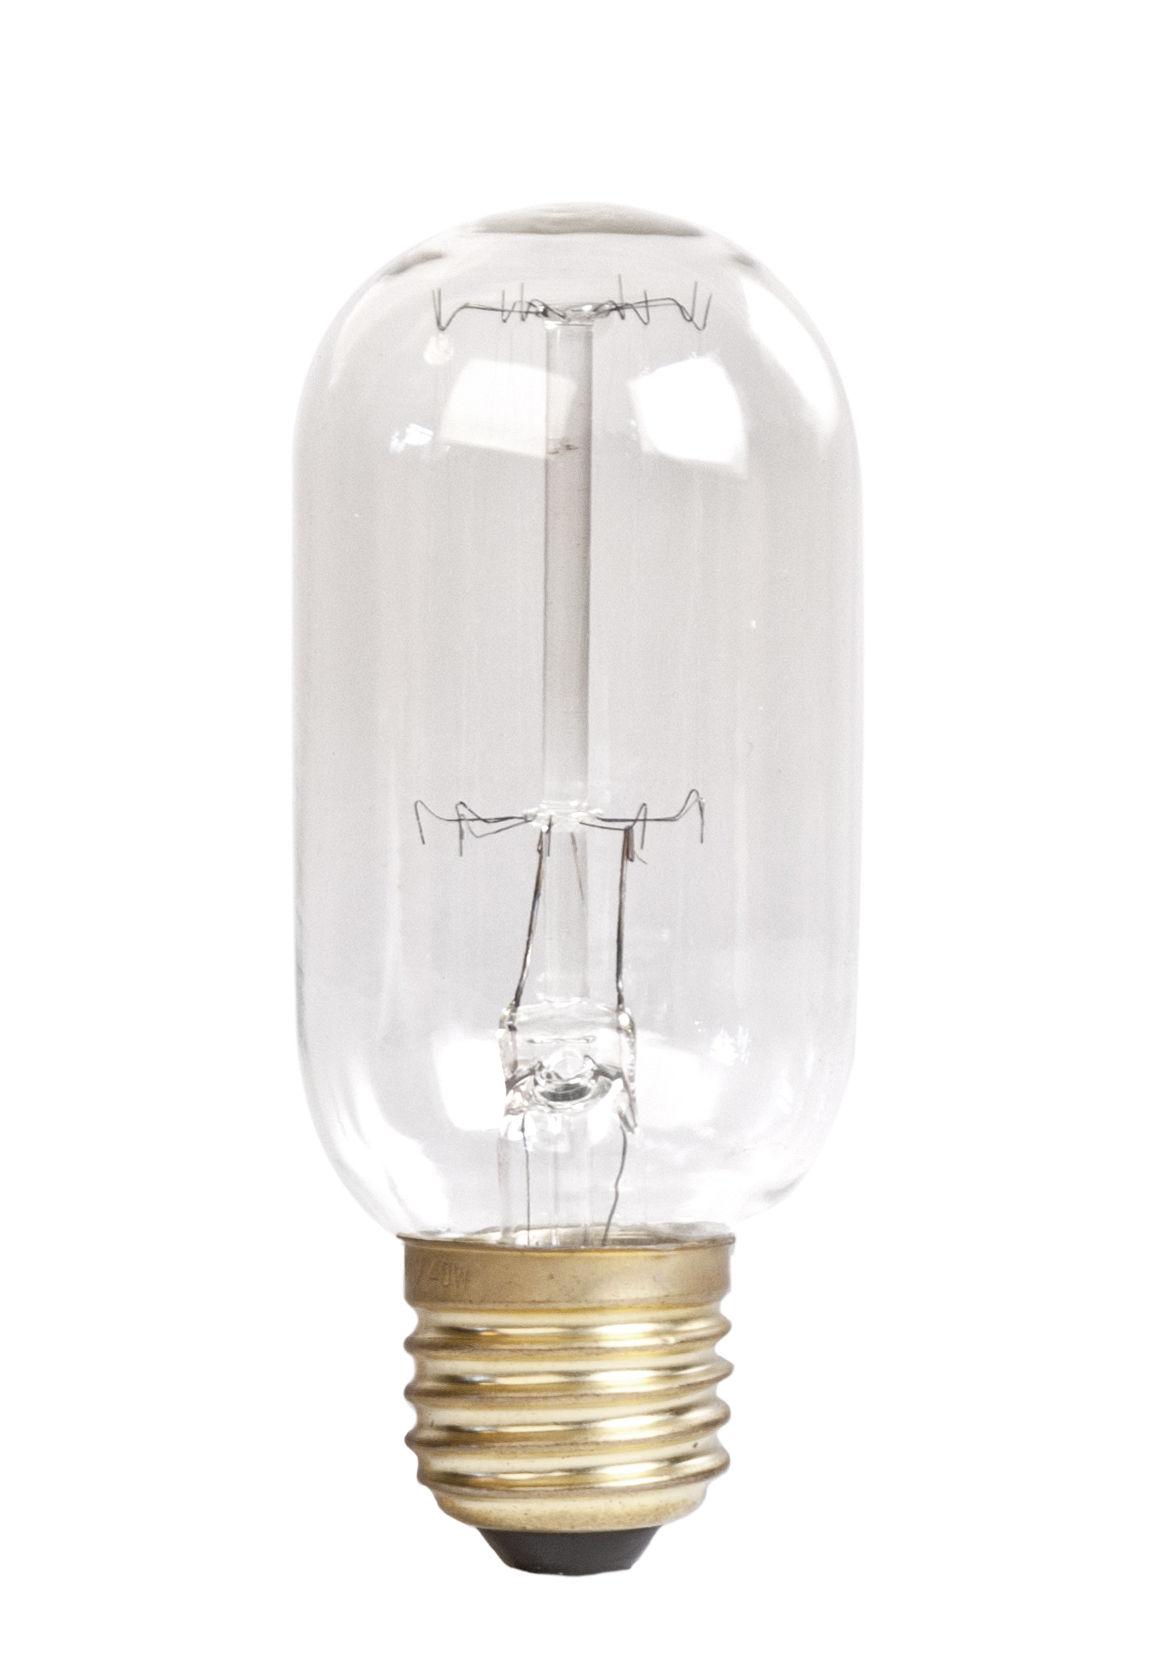 ampoule led filaments e27 t75 40w 500 lumen transparent or pop corn made in design. Black Bedroom Furniture Sets. Home Design Ideas